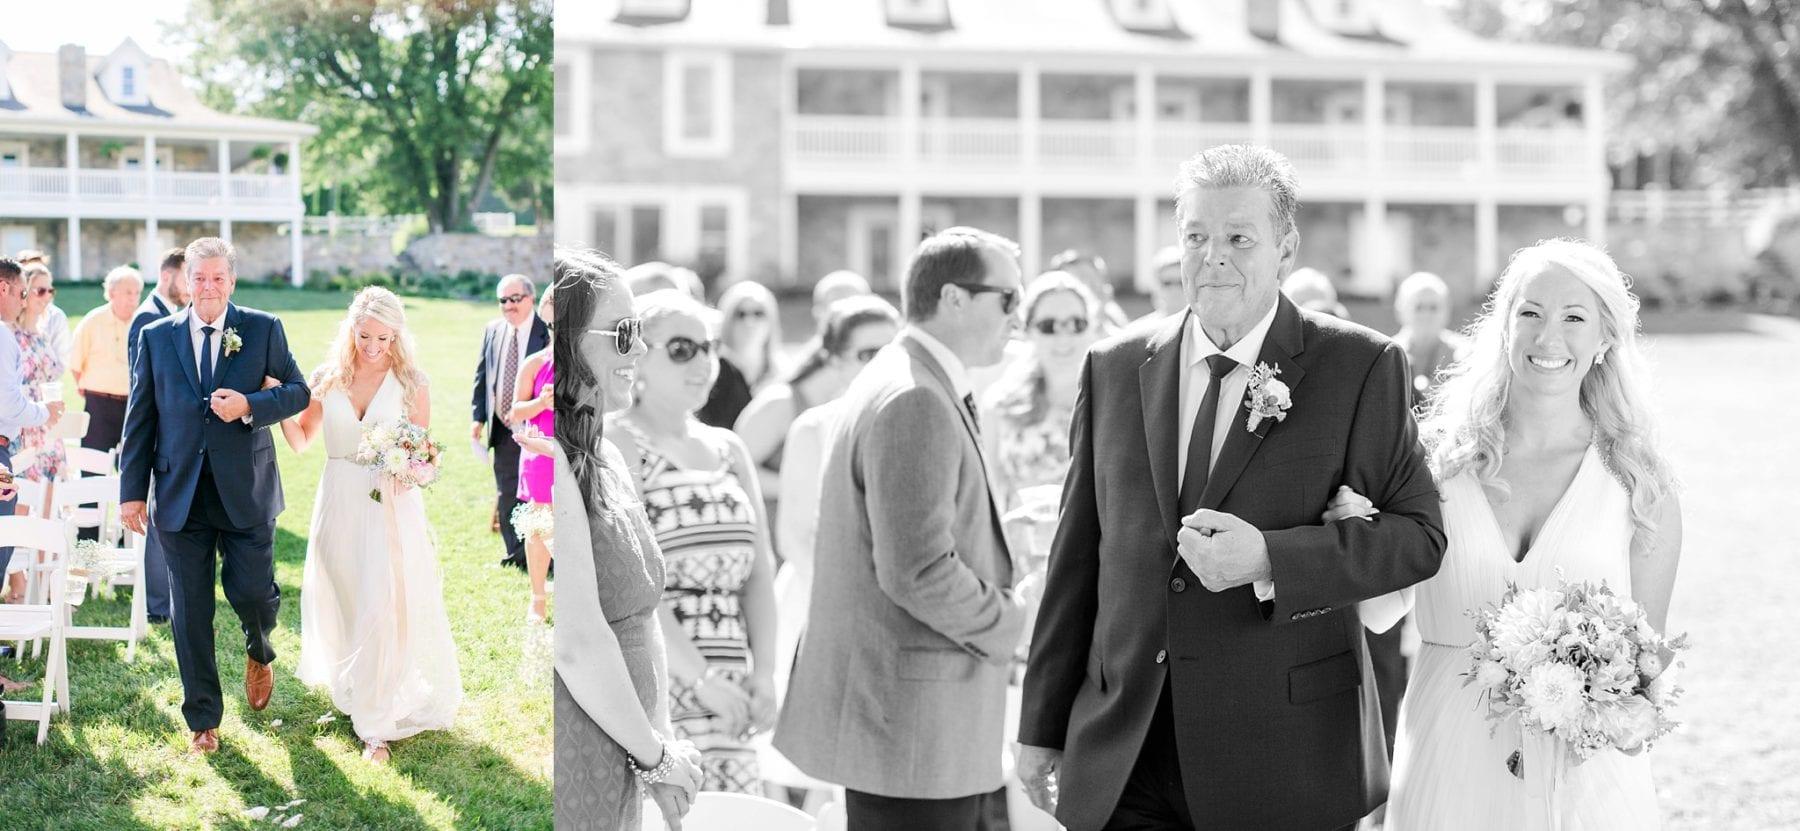 Pond View Farm Wedding Photos Maryland Wedding Photographer Kristen & Ryan Megan Kelsey Photography Blog-117.jpg